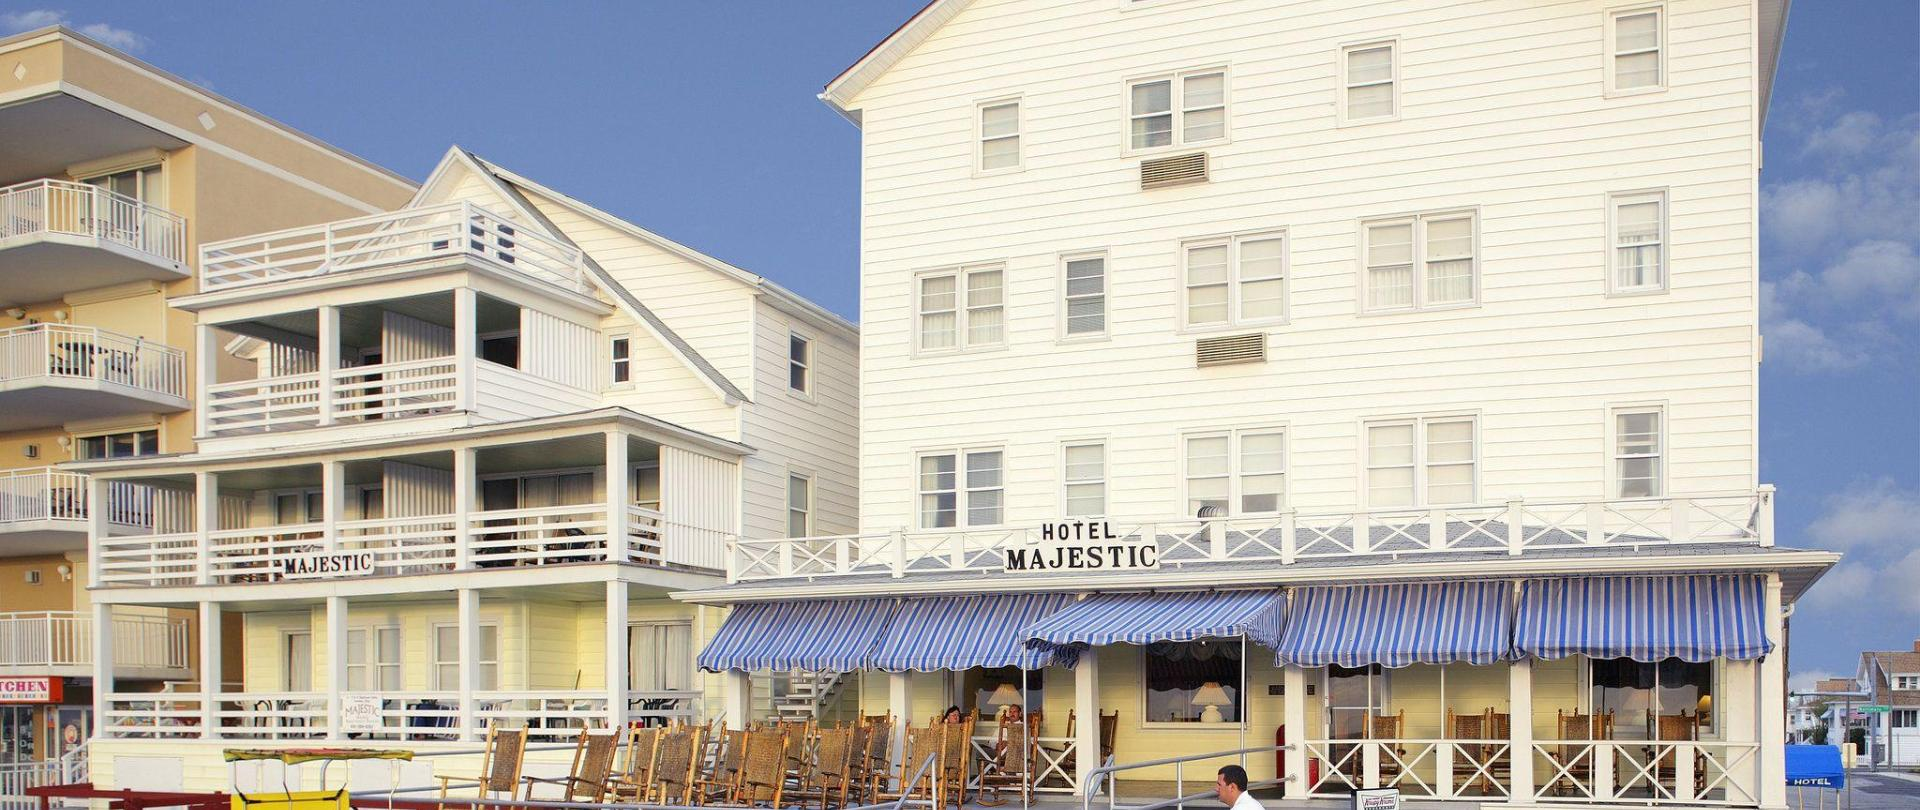 Hotels In Ocean City Md >> Majestic Hotel Ocean City Usa